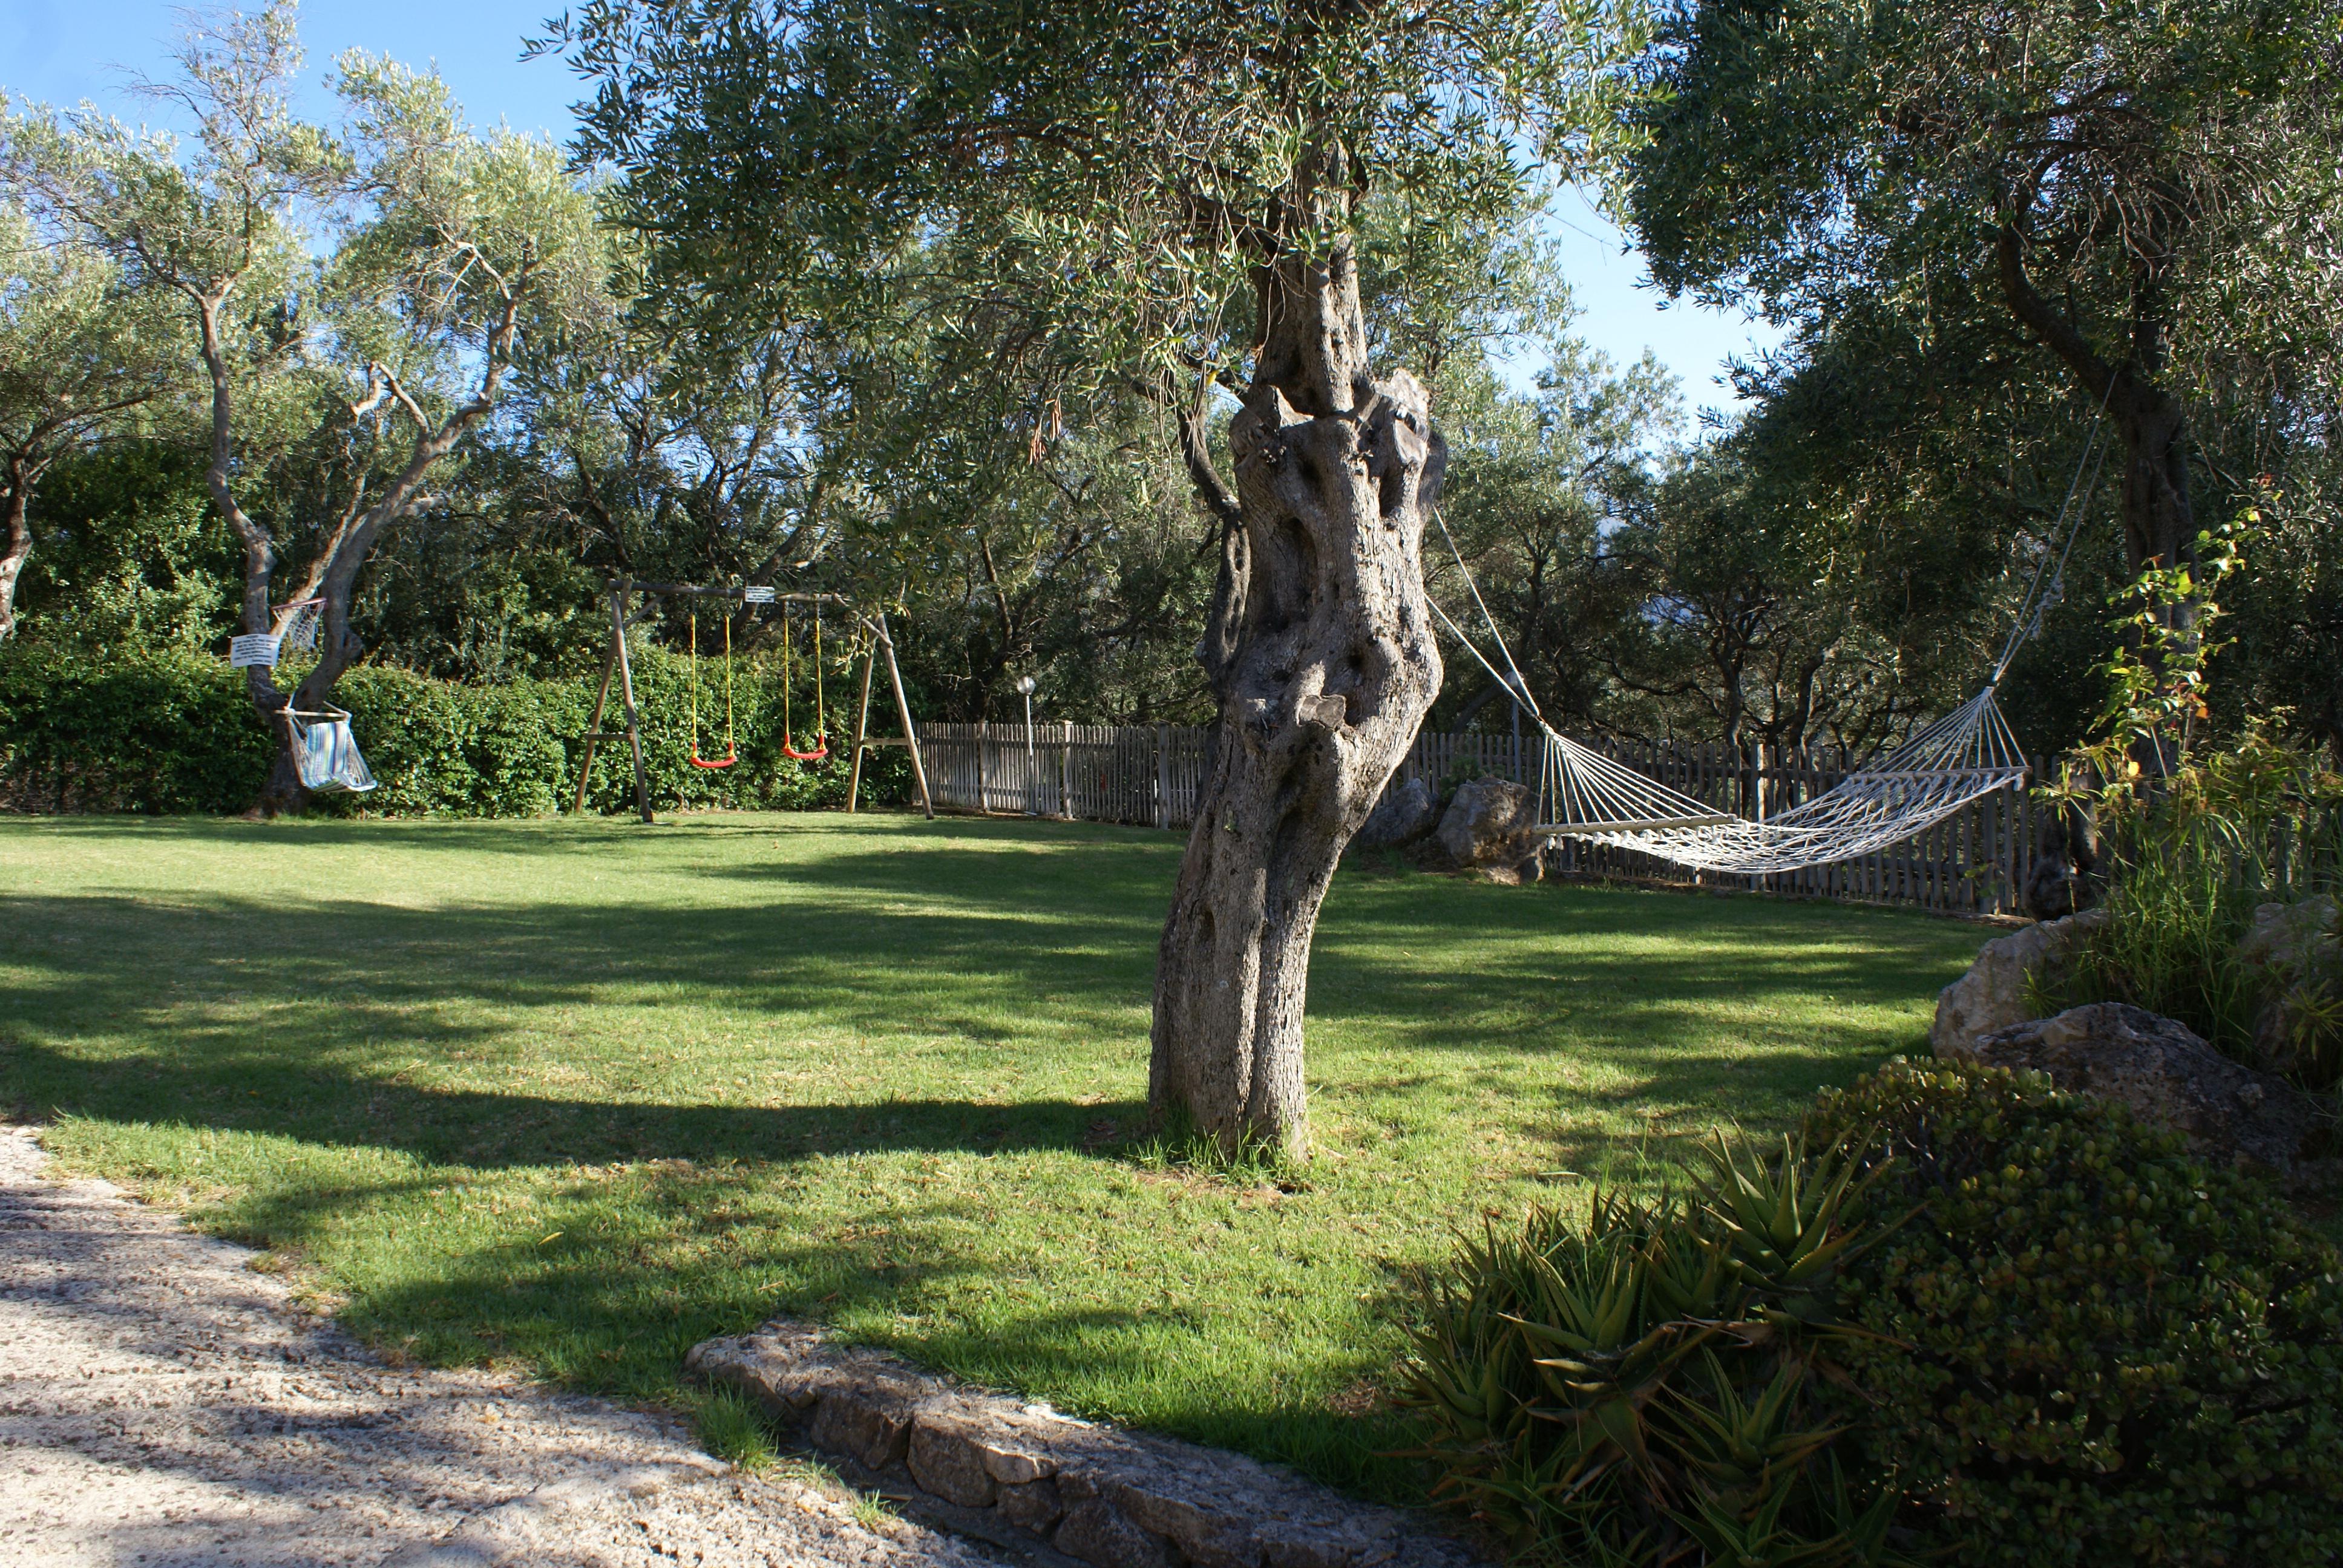 Liegewiese - Korfu Villa Sankt Nikolas Strandhaus, Agios Spiridon, KorfuCorfu